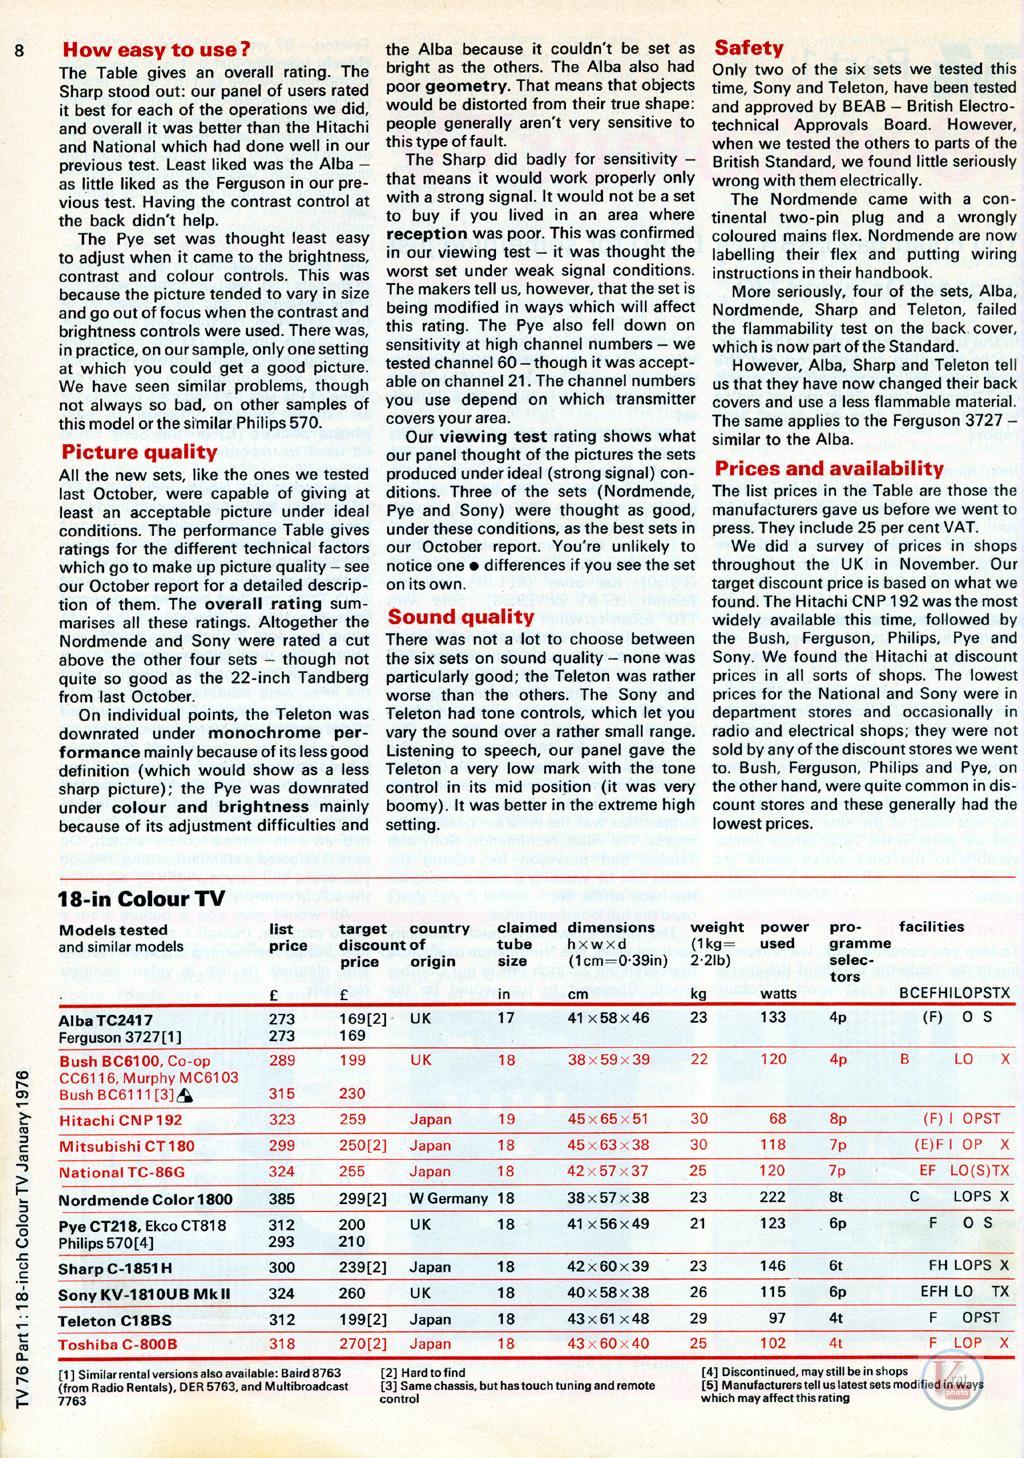 1976 Report 33